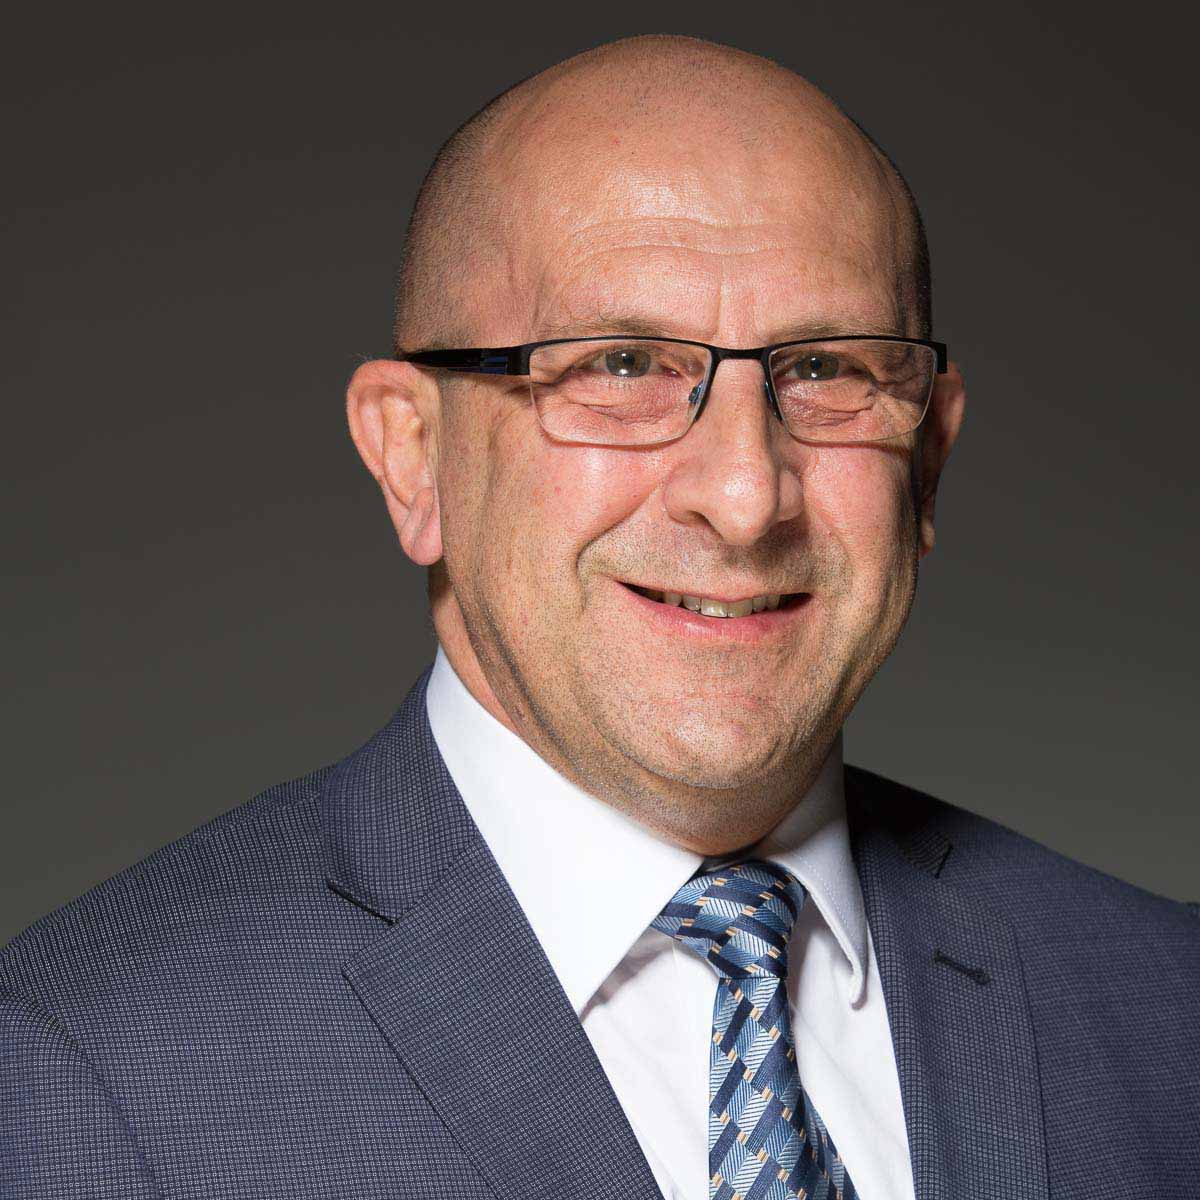 Tony Imbruglia, Director, My Mortgage Professionals